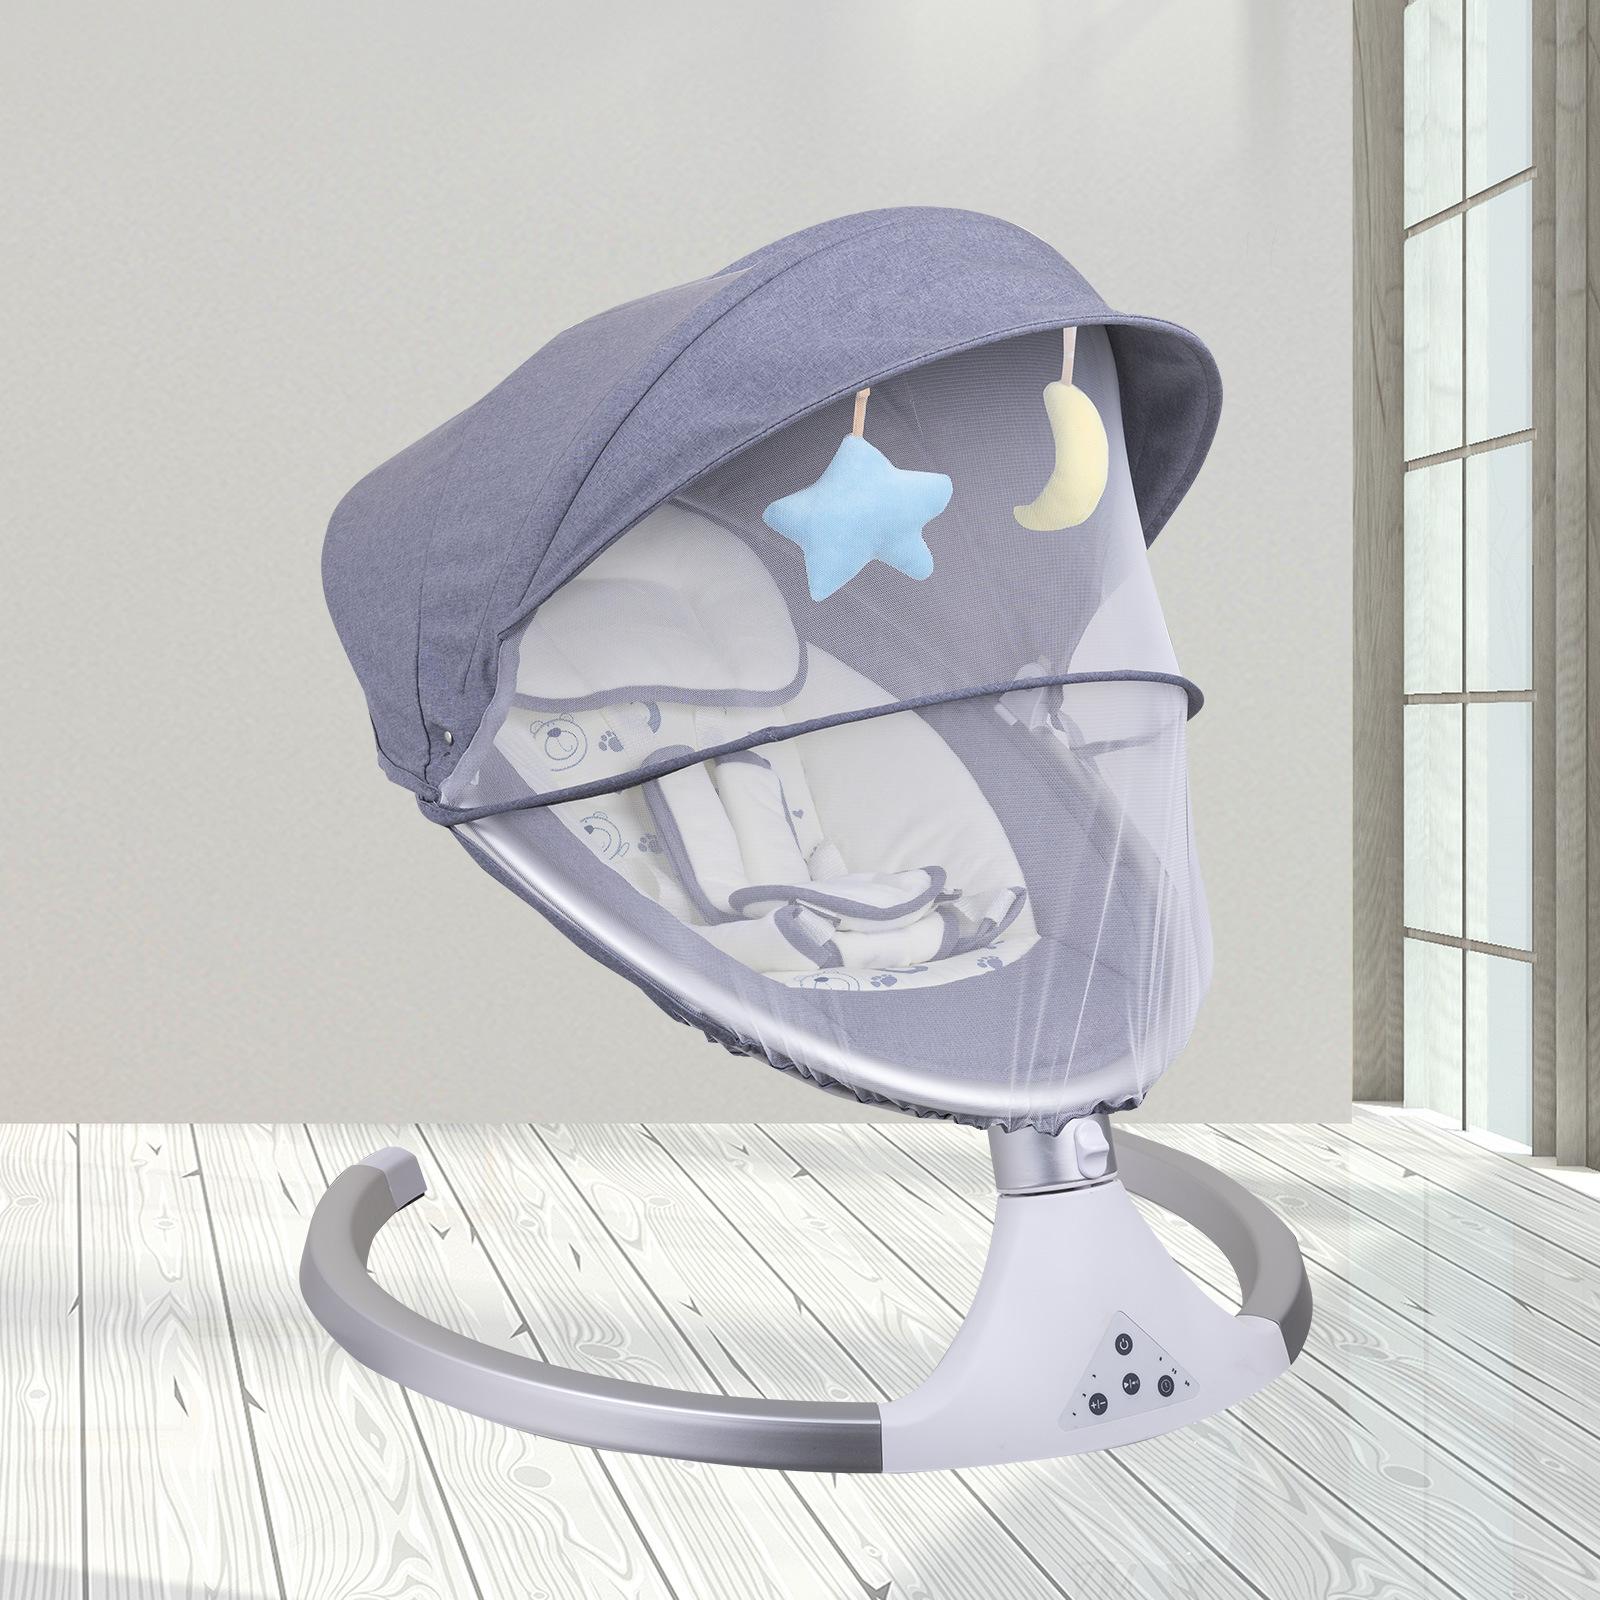 Coax baby artifact baby BB كرسي هزاز كهربائي مبيعات المصنع مباشرة جديد الذكية بلوتوث مهد سرير كهربائي